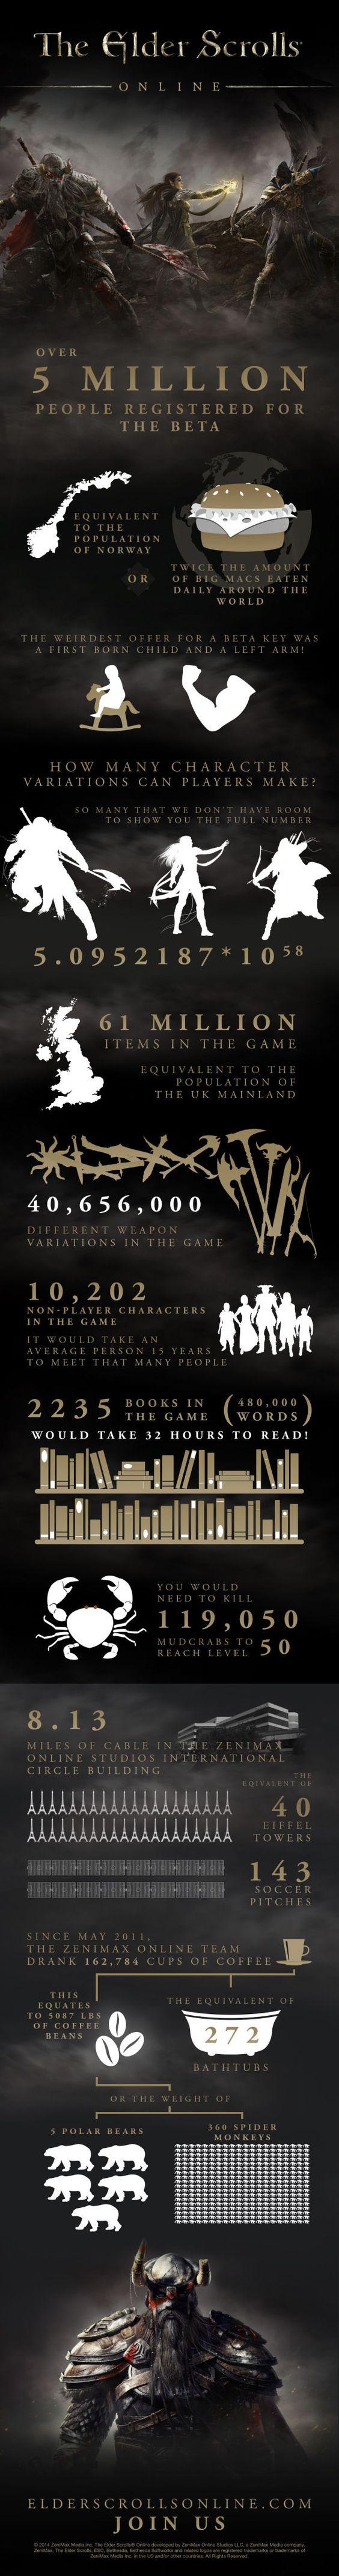 Elder Scrolls Online : Interesting Facts